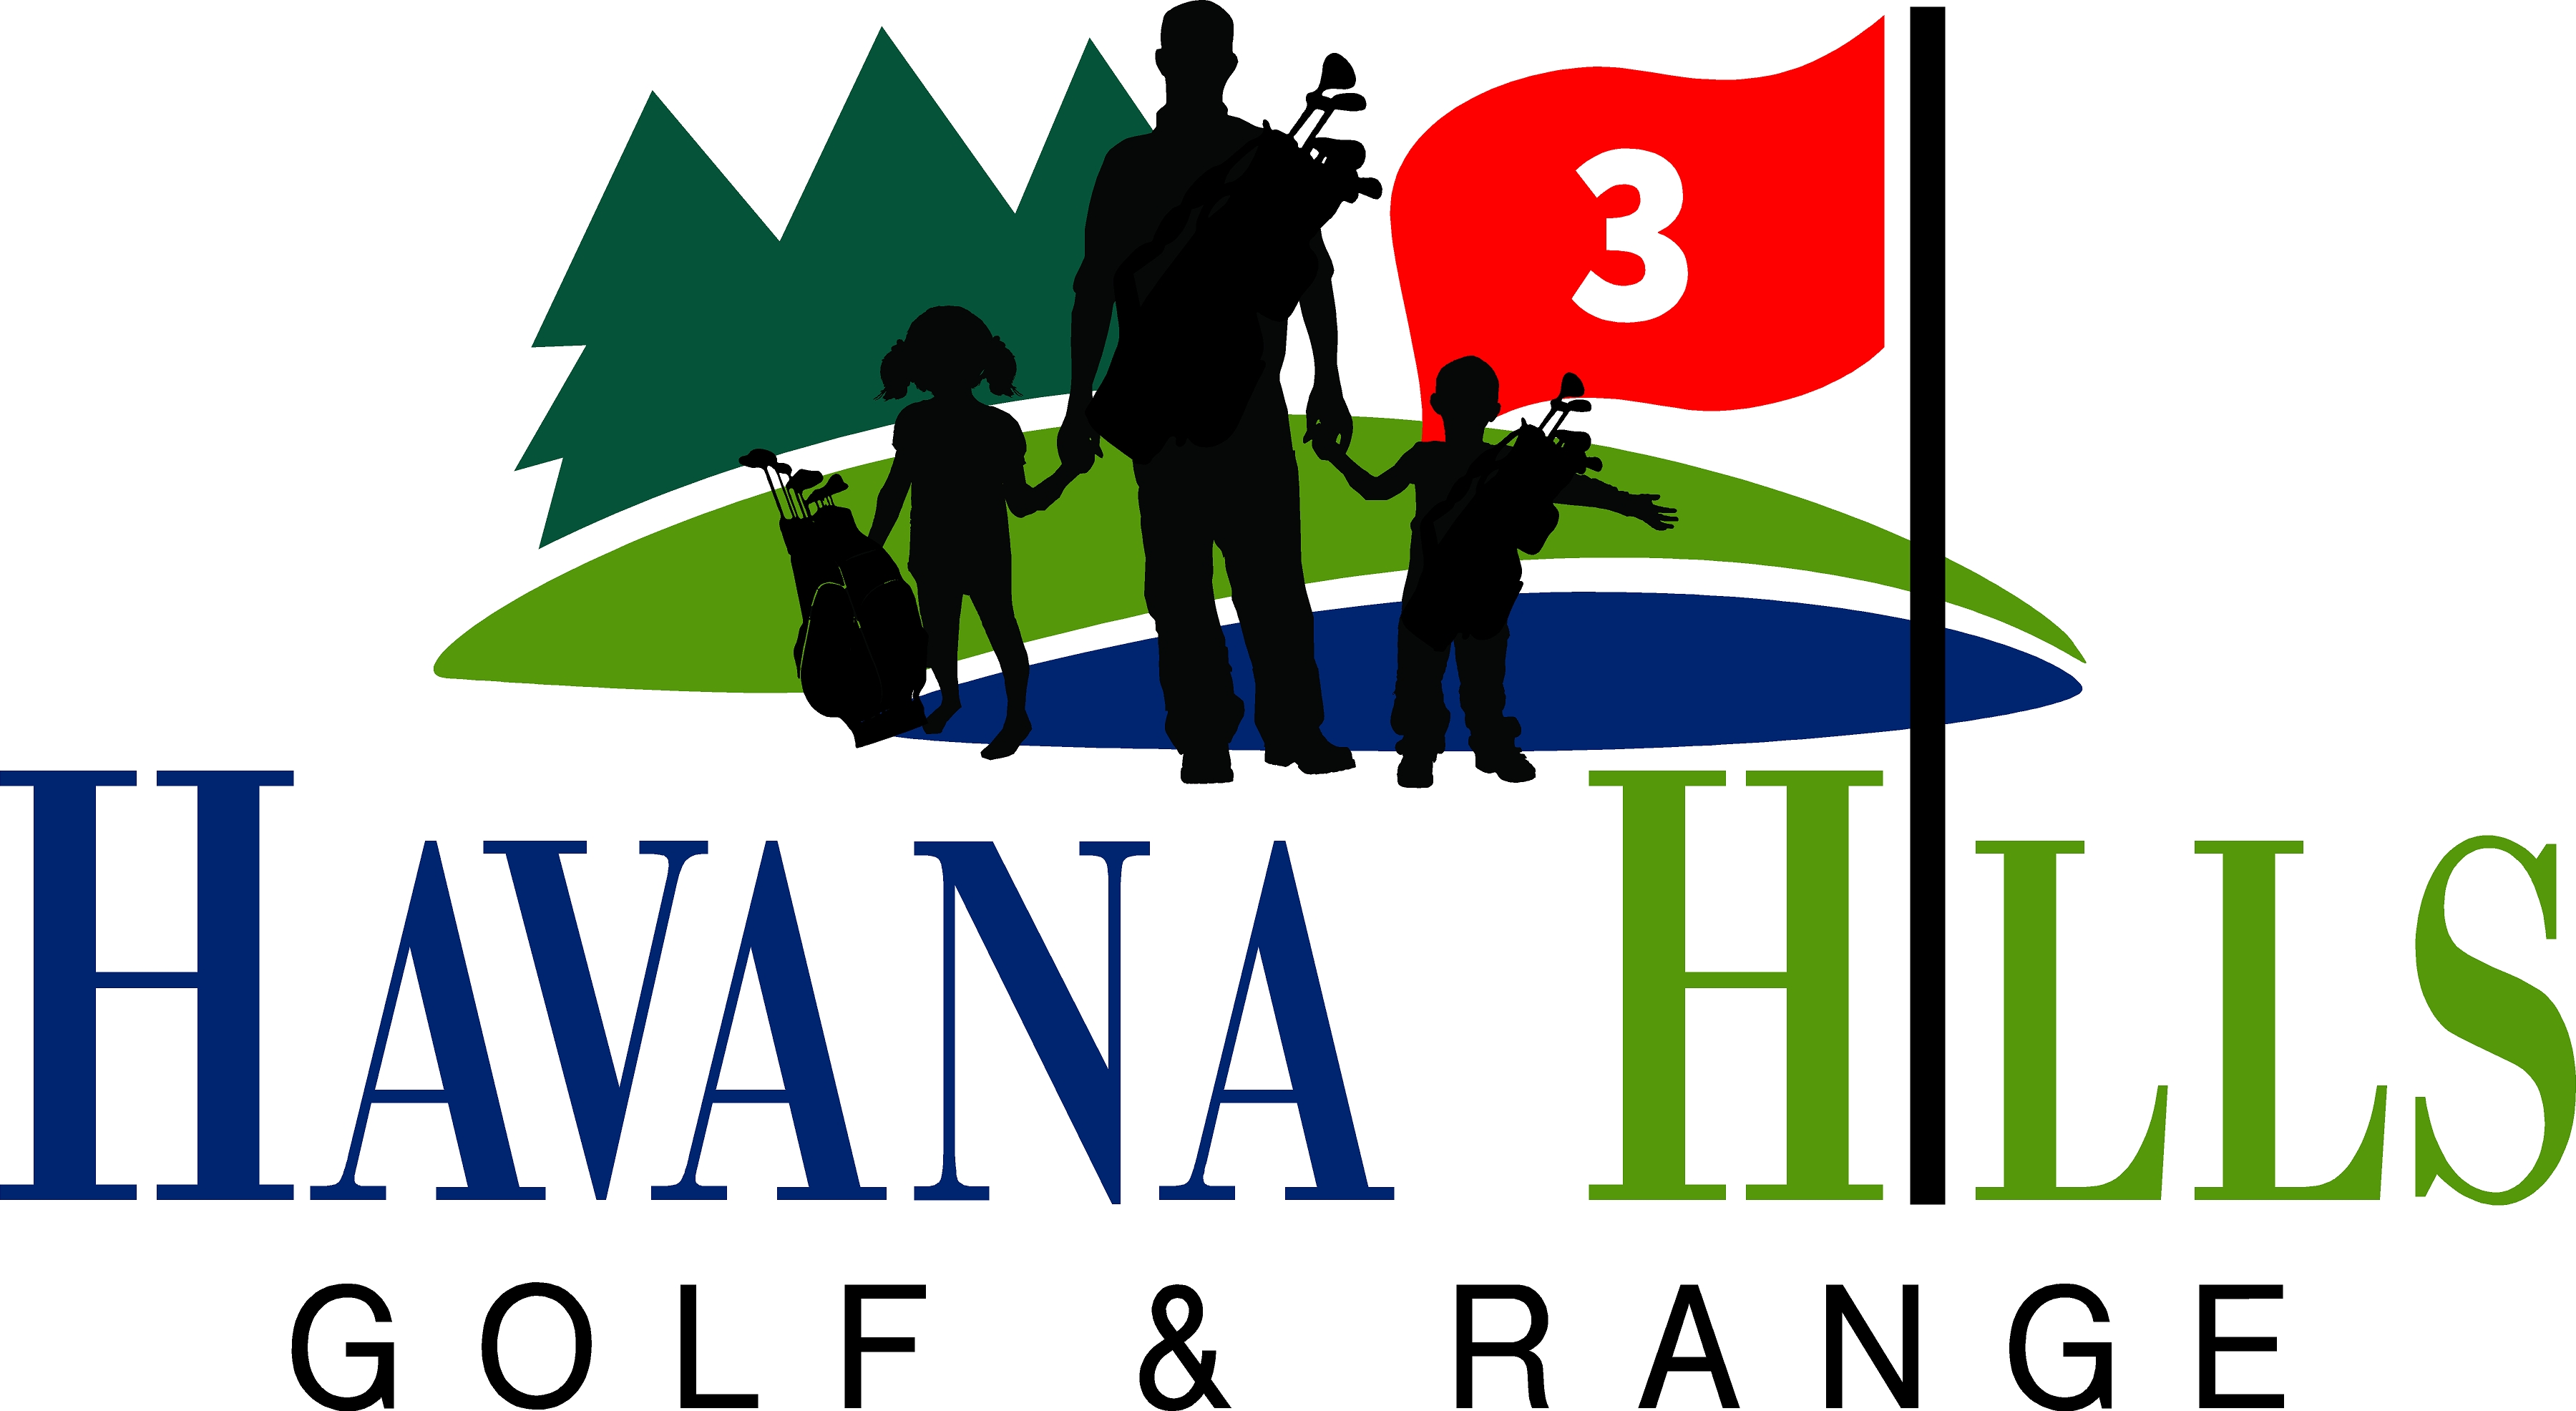 Havana Hills Golf And Driving Range 10 Gift Certificate